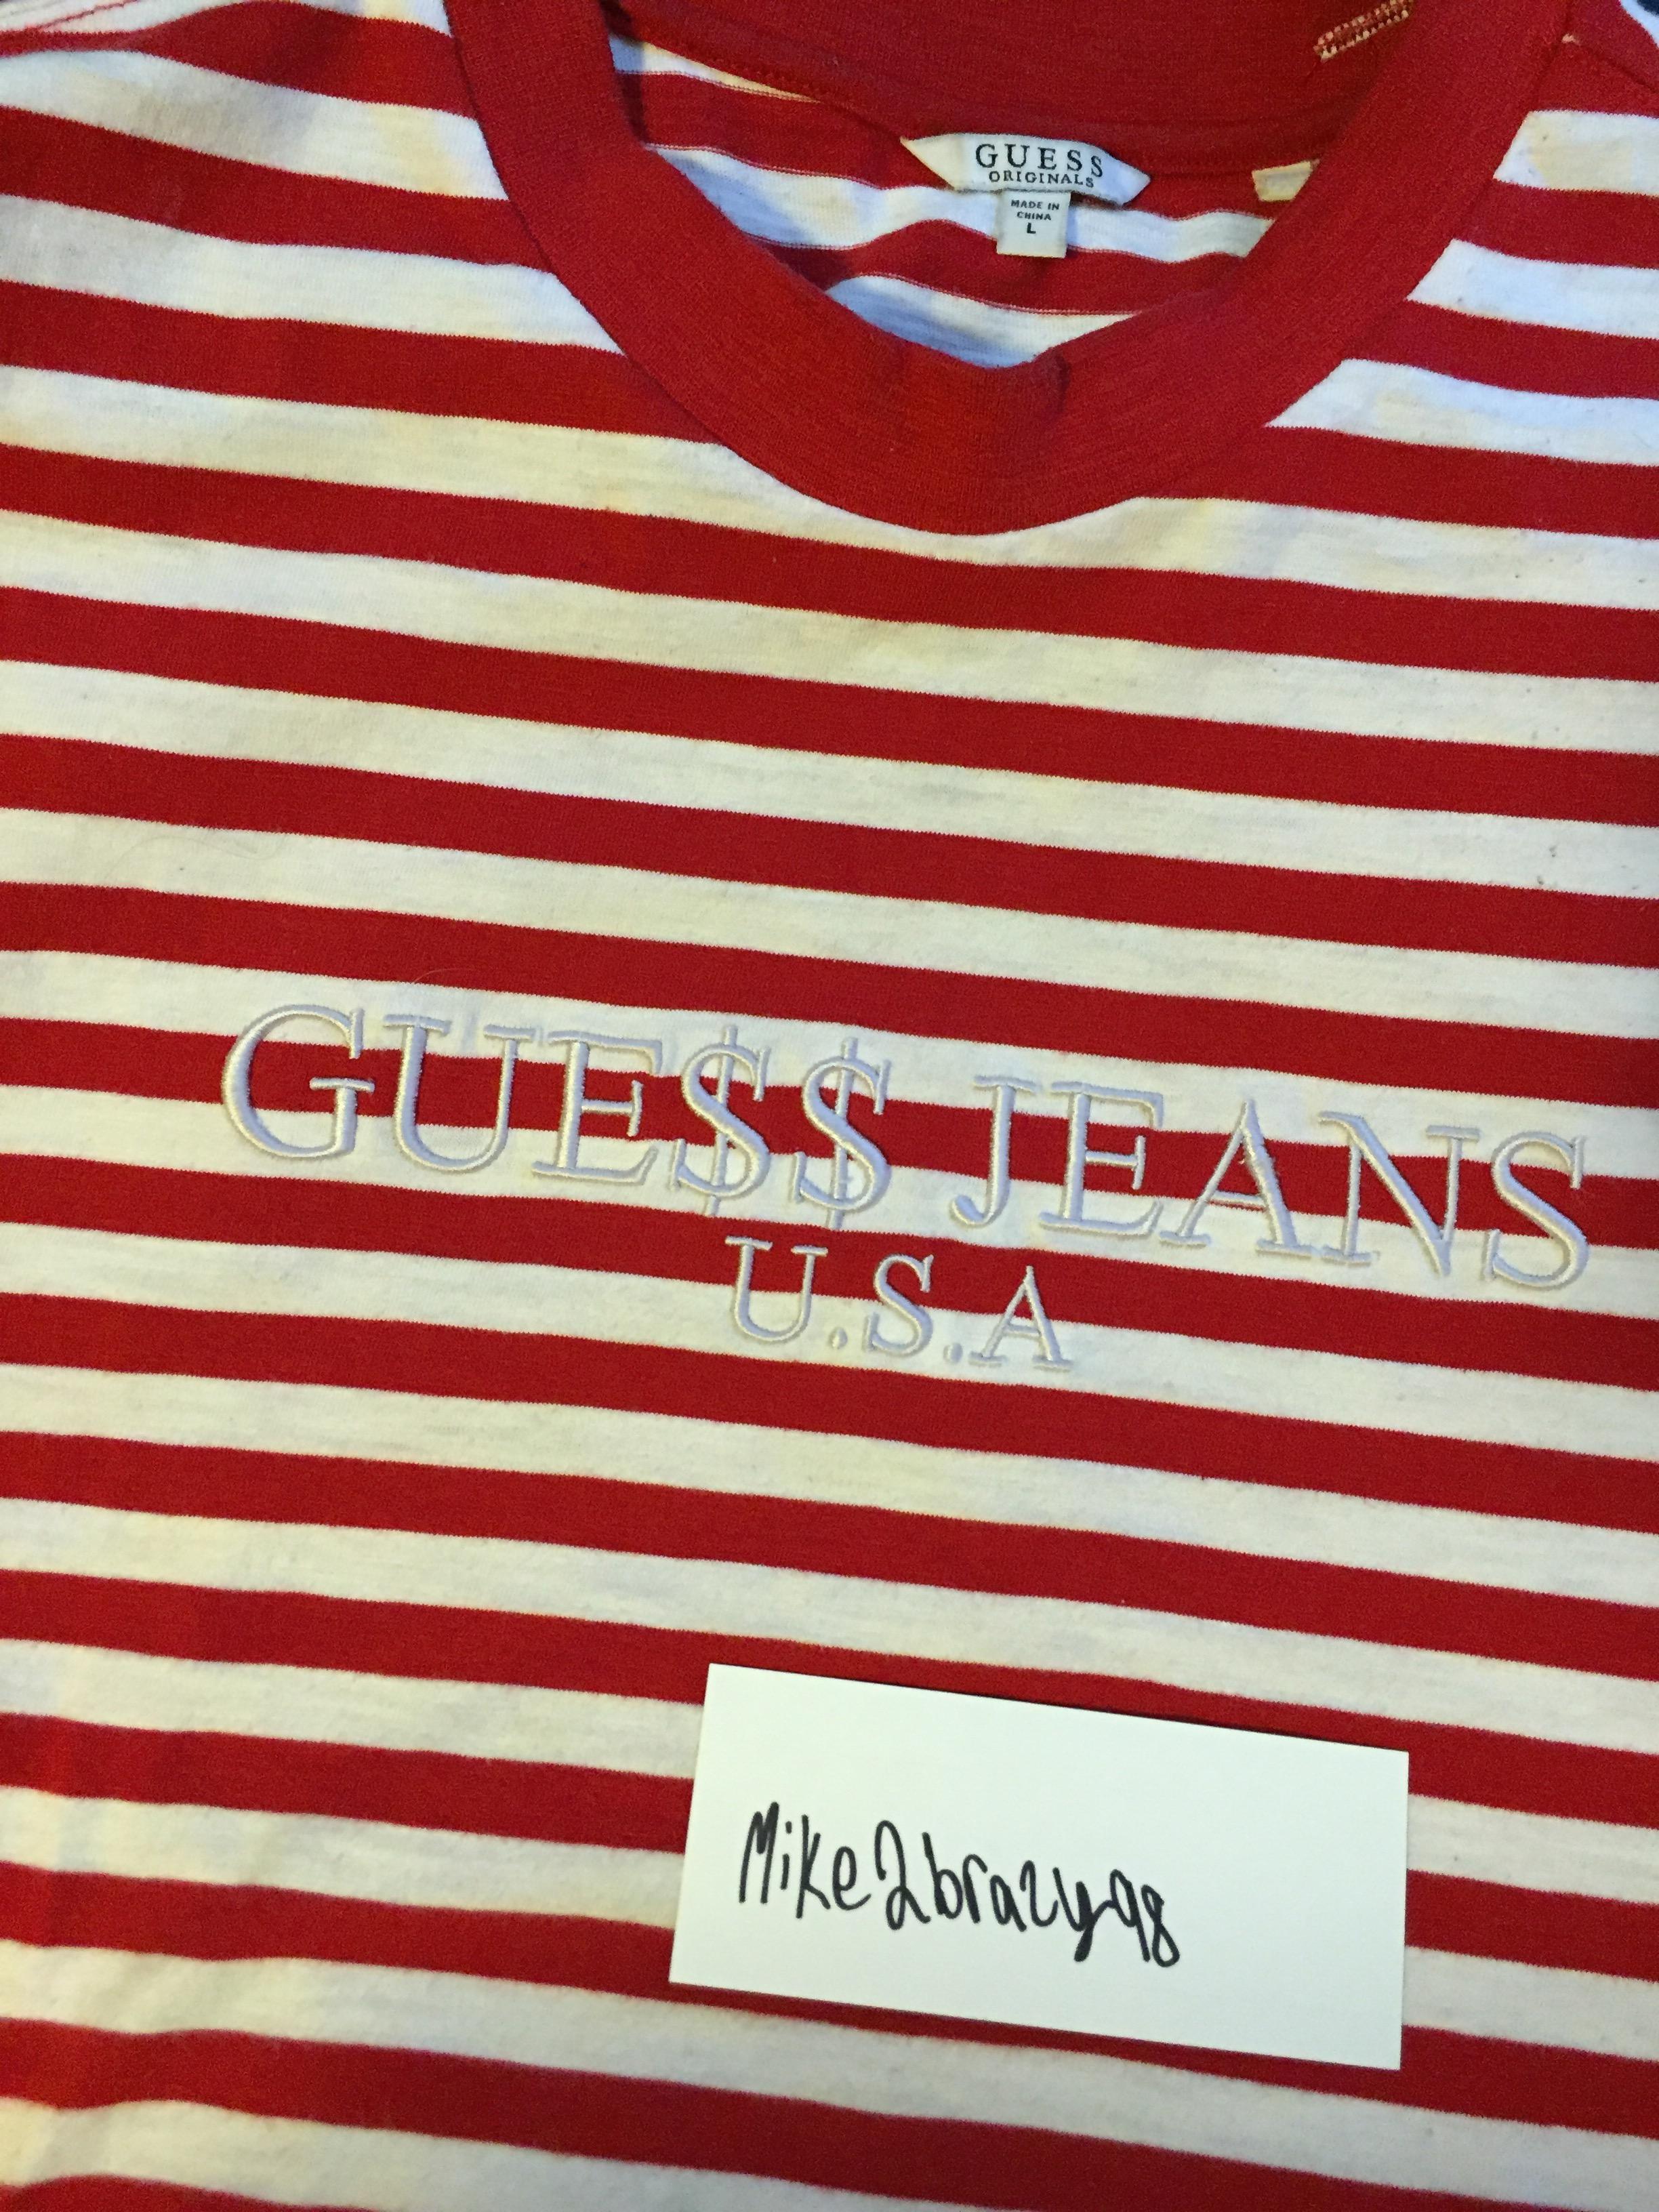 8b56731fb3c0 Guess Jeans Asap Rocky Striped Shirt - raveitsafe